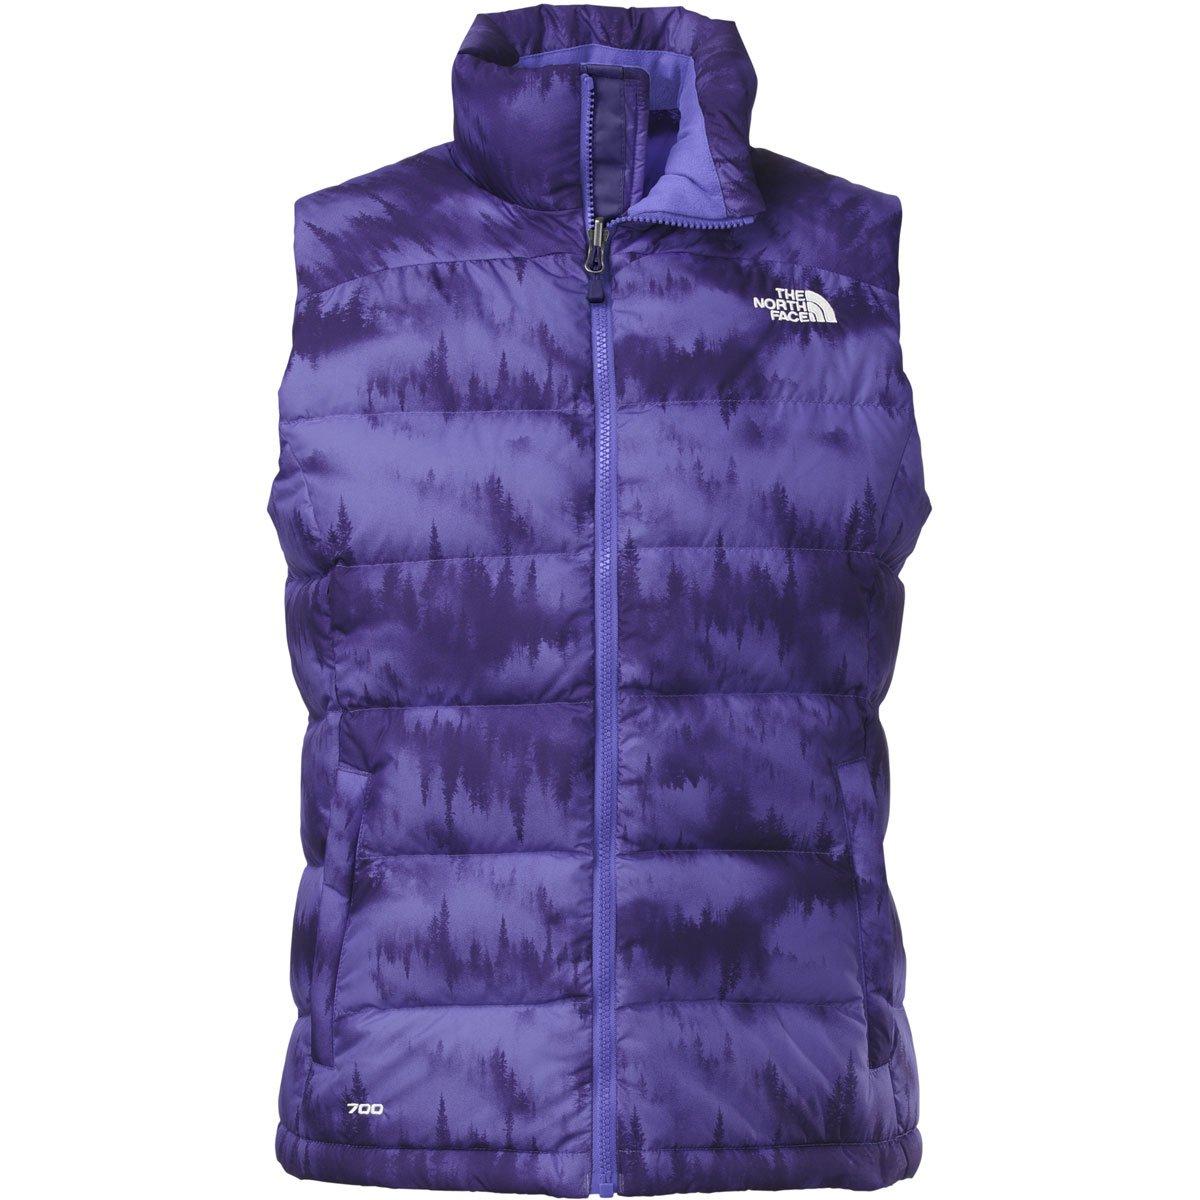 Garnet Purple Mountain Scape Print THE NORTH FACE Women's Nuptse 2 Vest